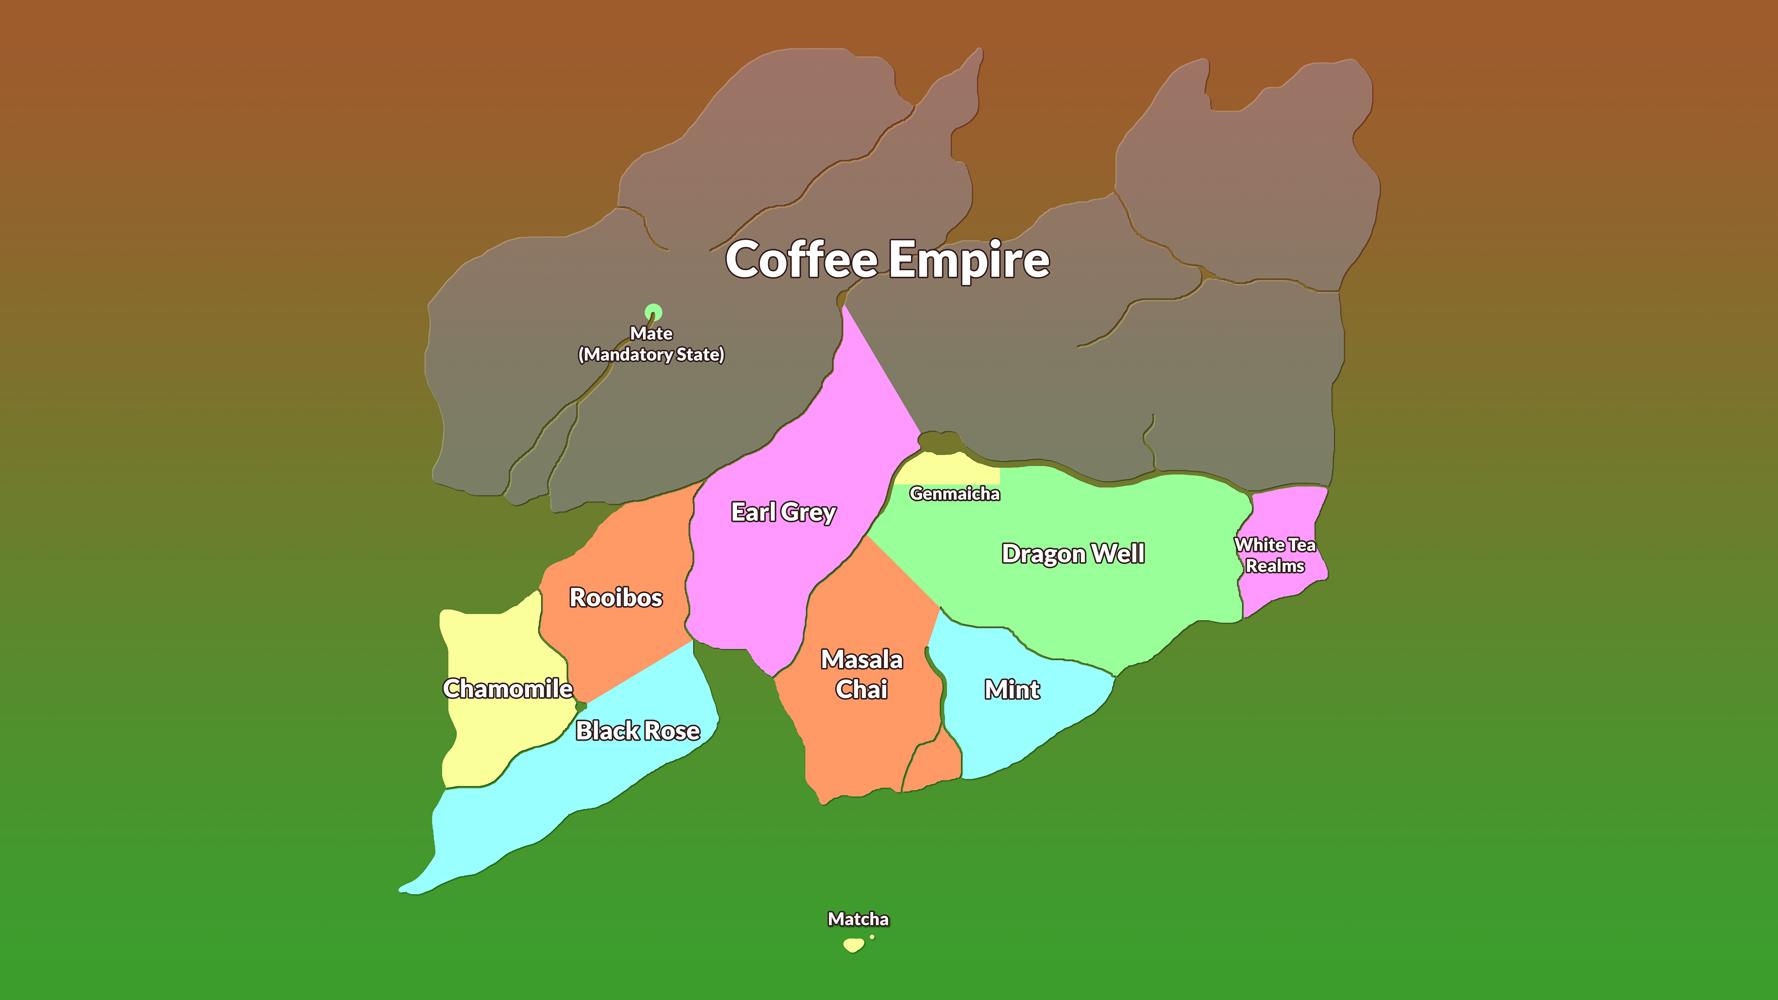 The world of Sovereign Tea